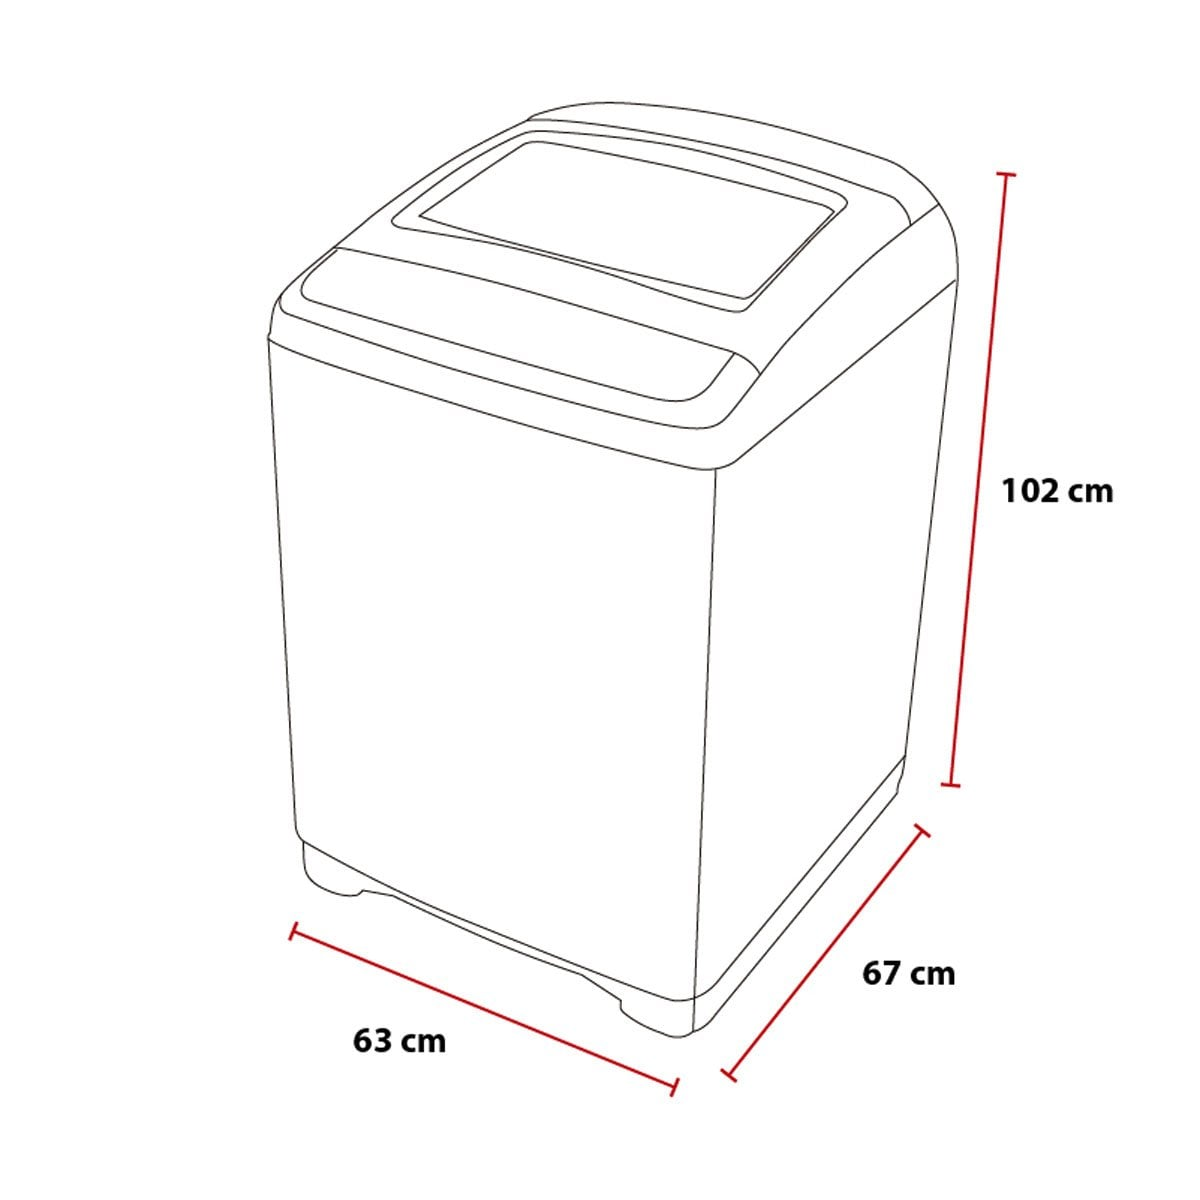 Lavadora daewoo superior 18kg roja